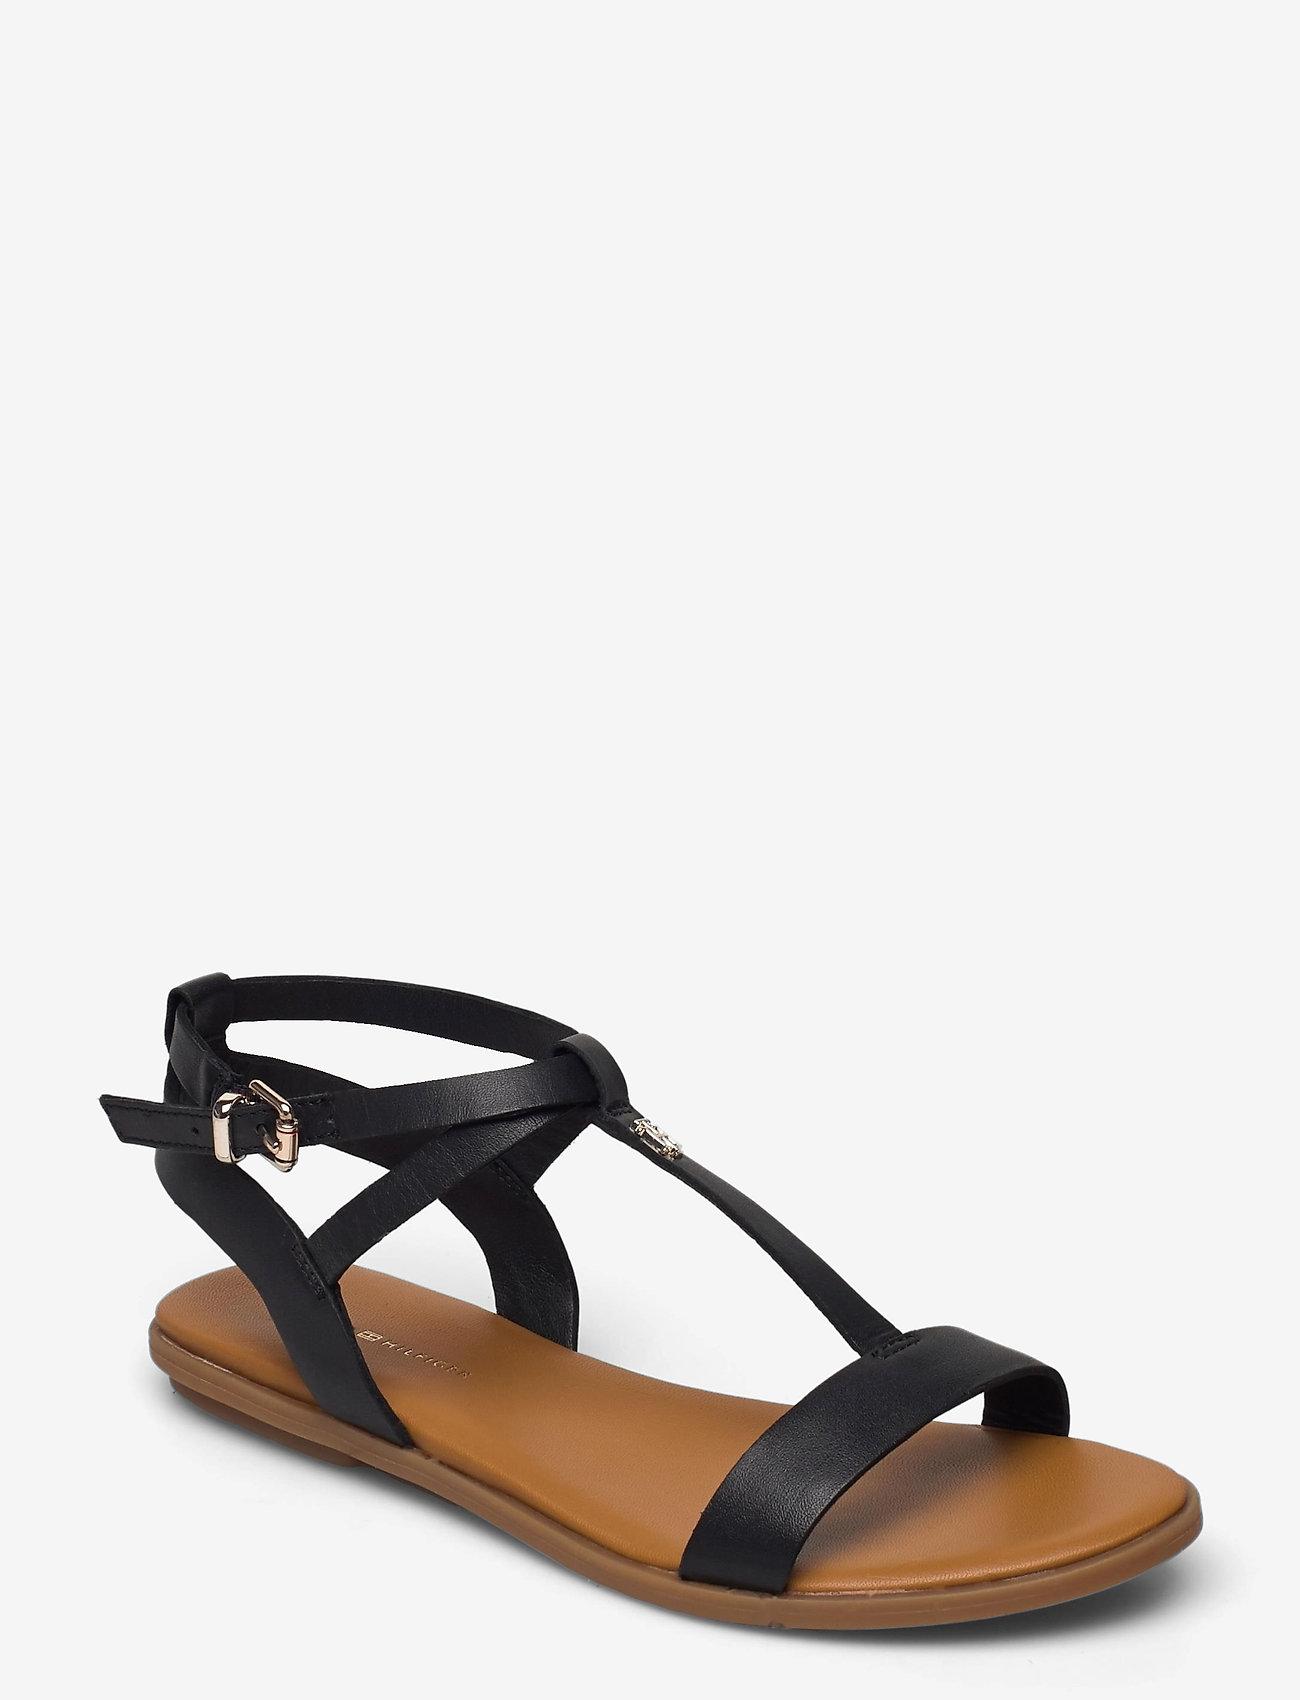 Tommy Hilfiger - FEMININE LEATHER FLAT SANDAL - flat sandals - black - 0